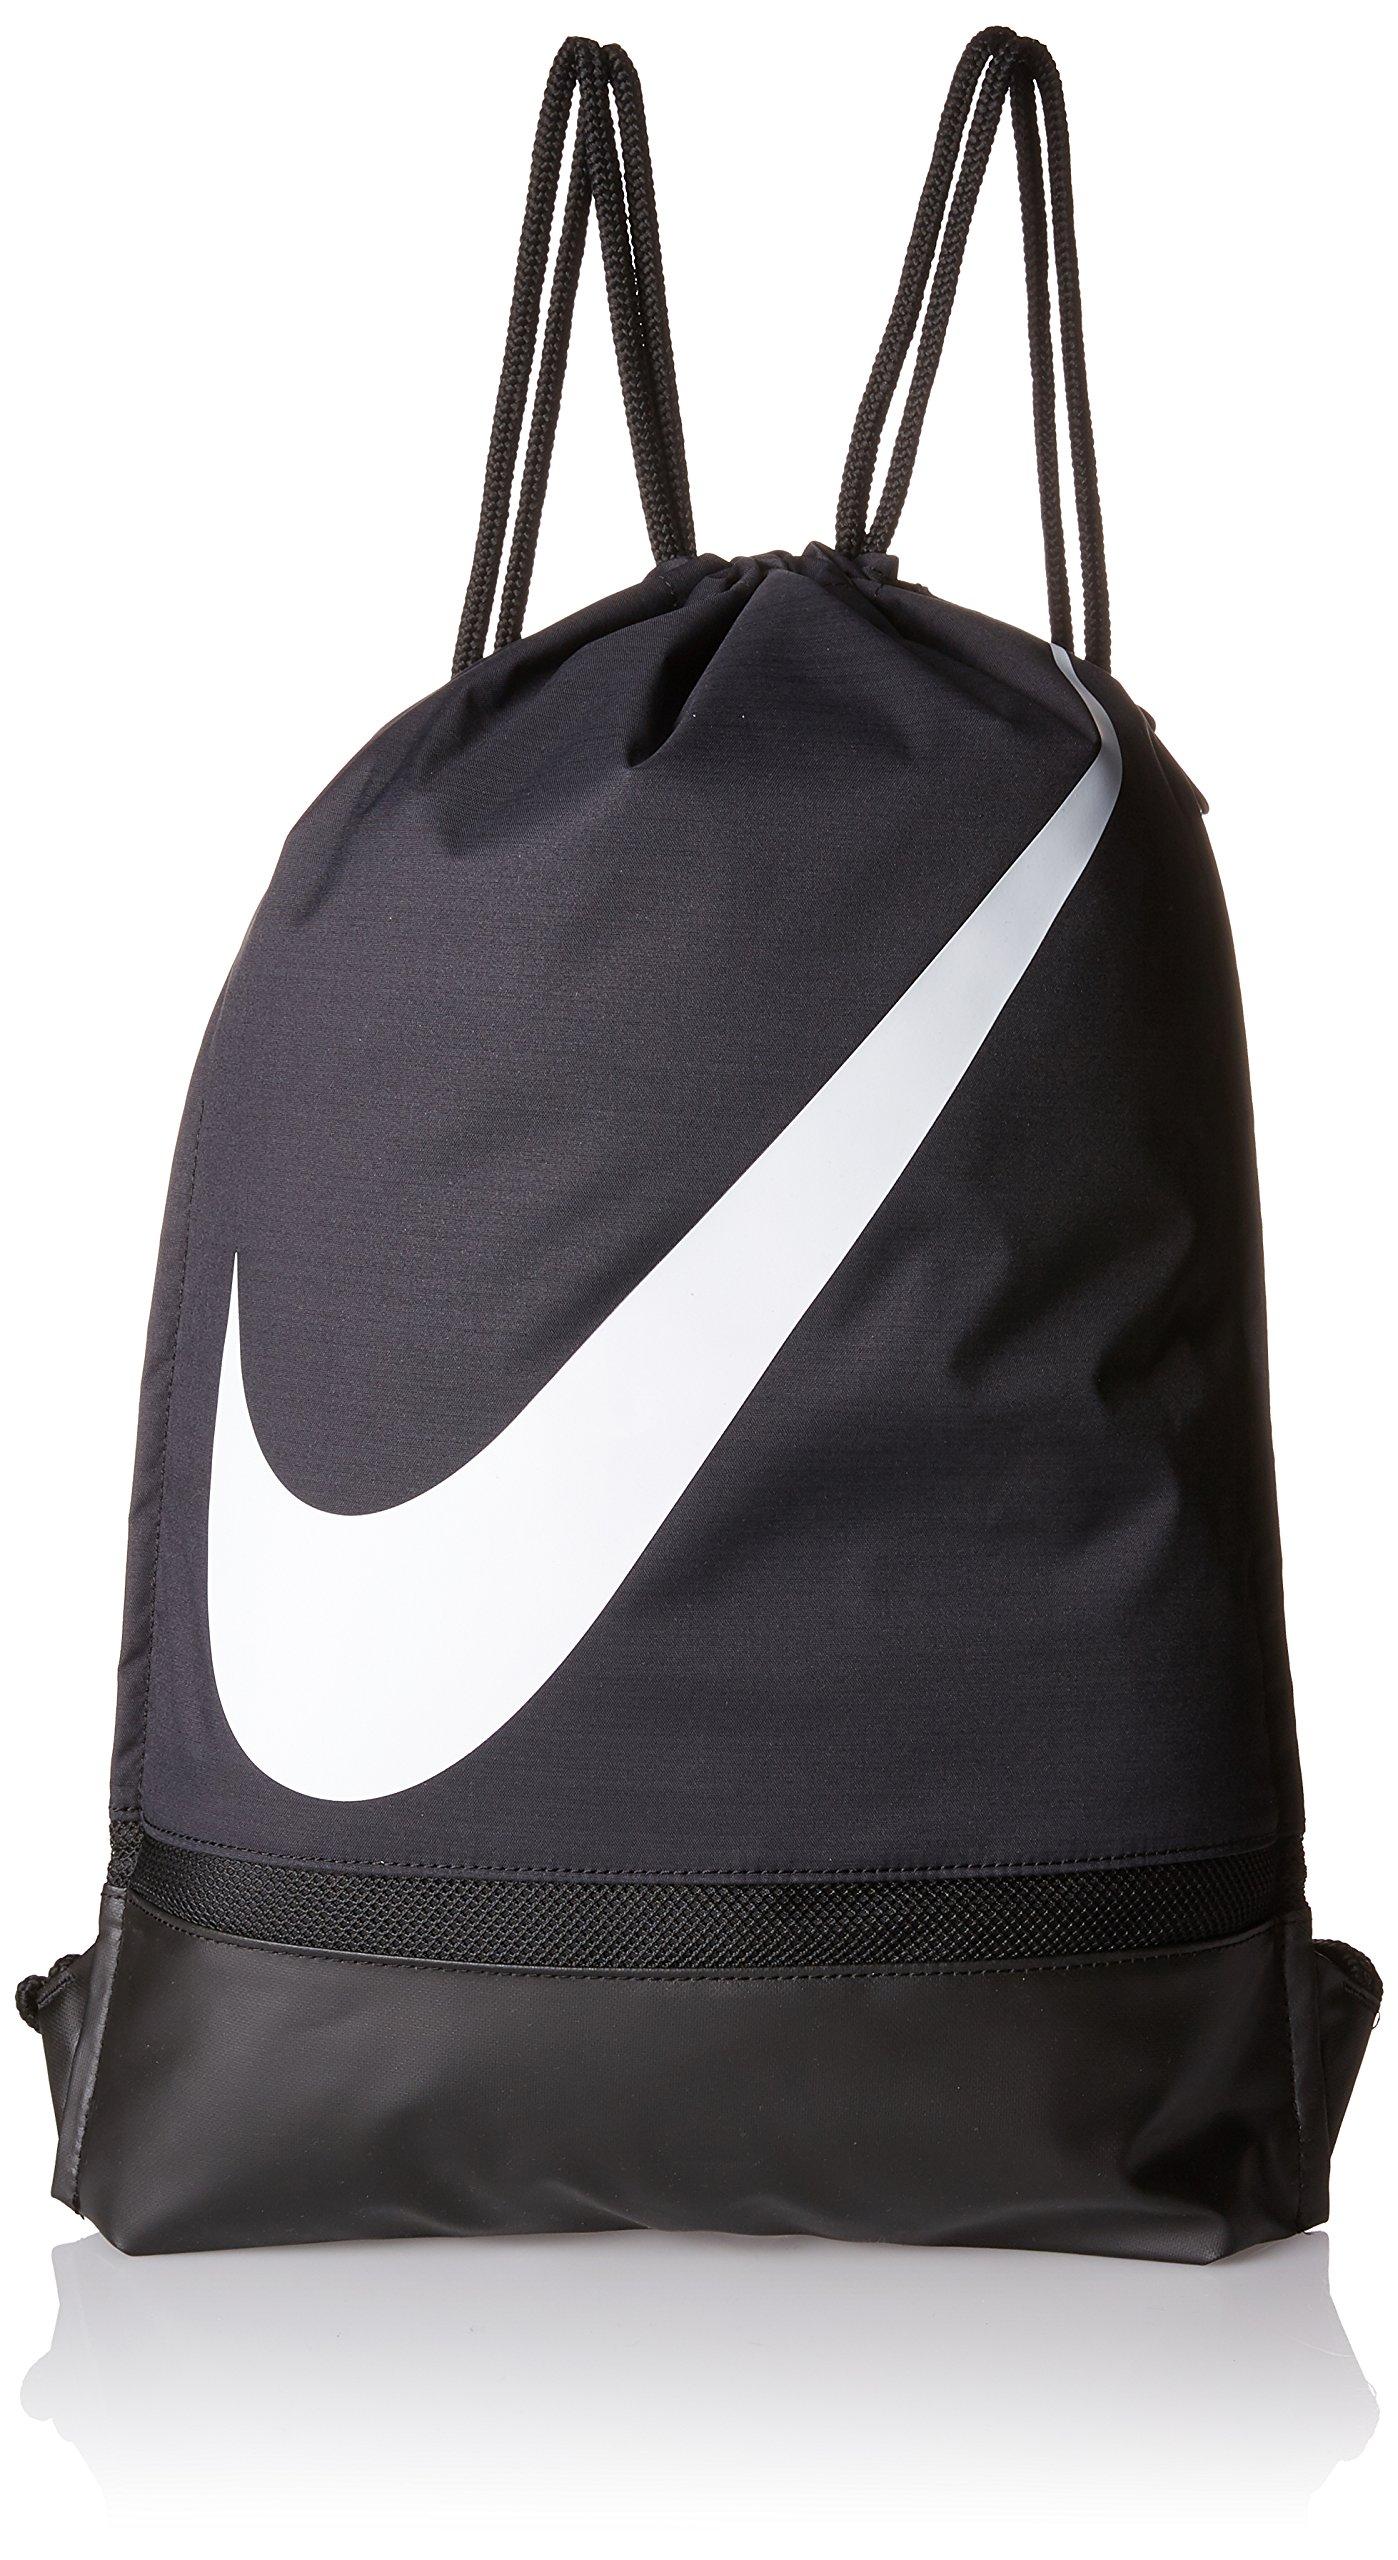 818pLV SyZL - Nike Gymsack Saco de Gimnasia De Fútbol, Unisex Adulto